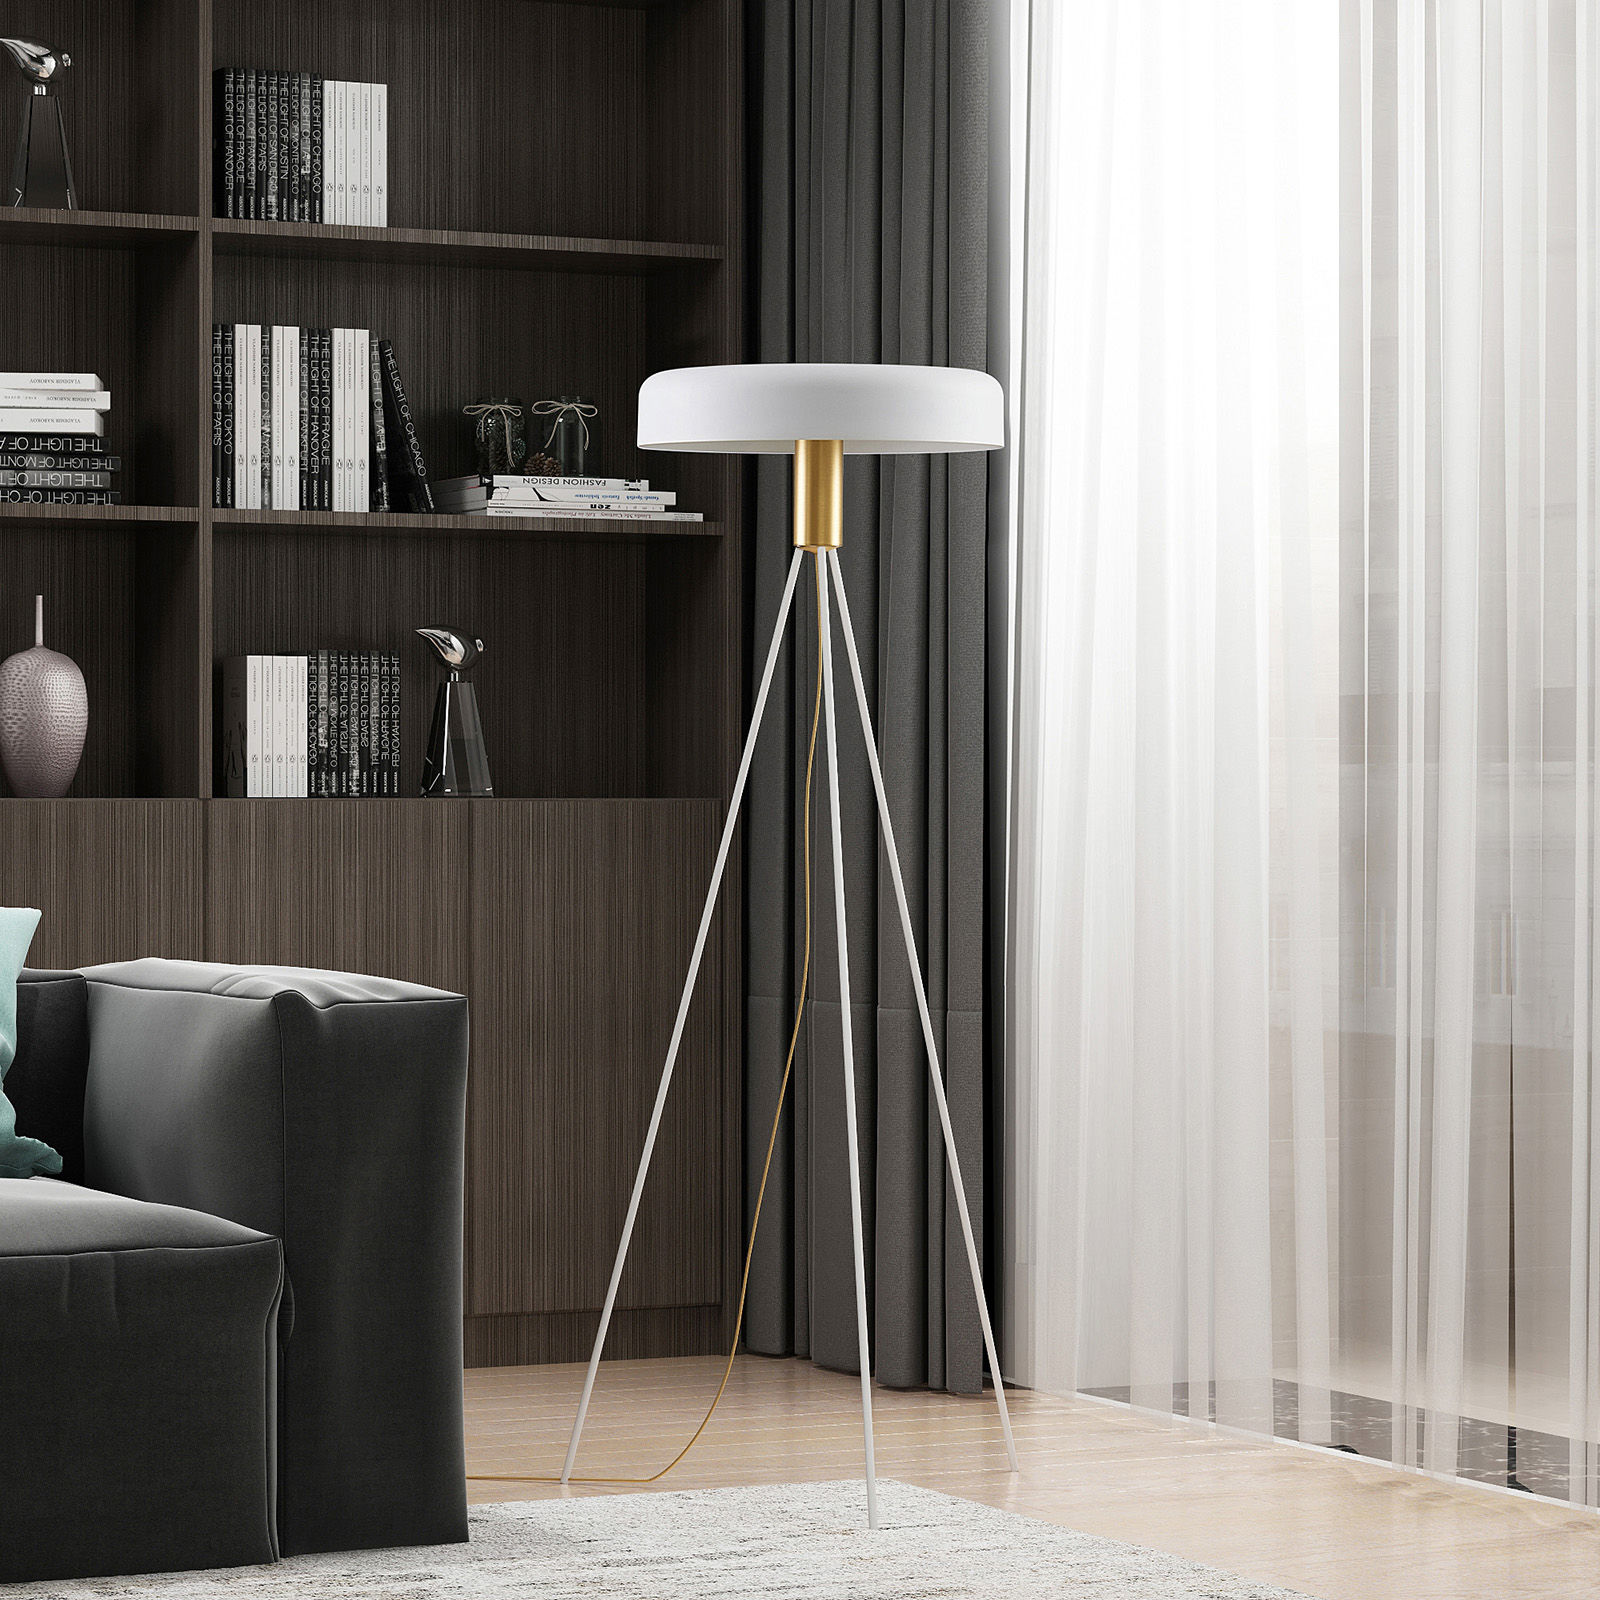 Lucande Filoreta lampa podłogowa biała